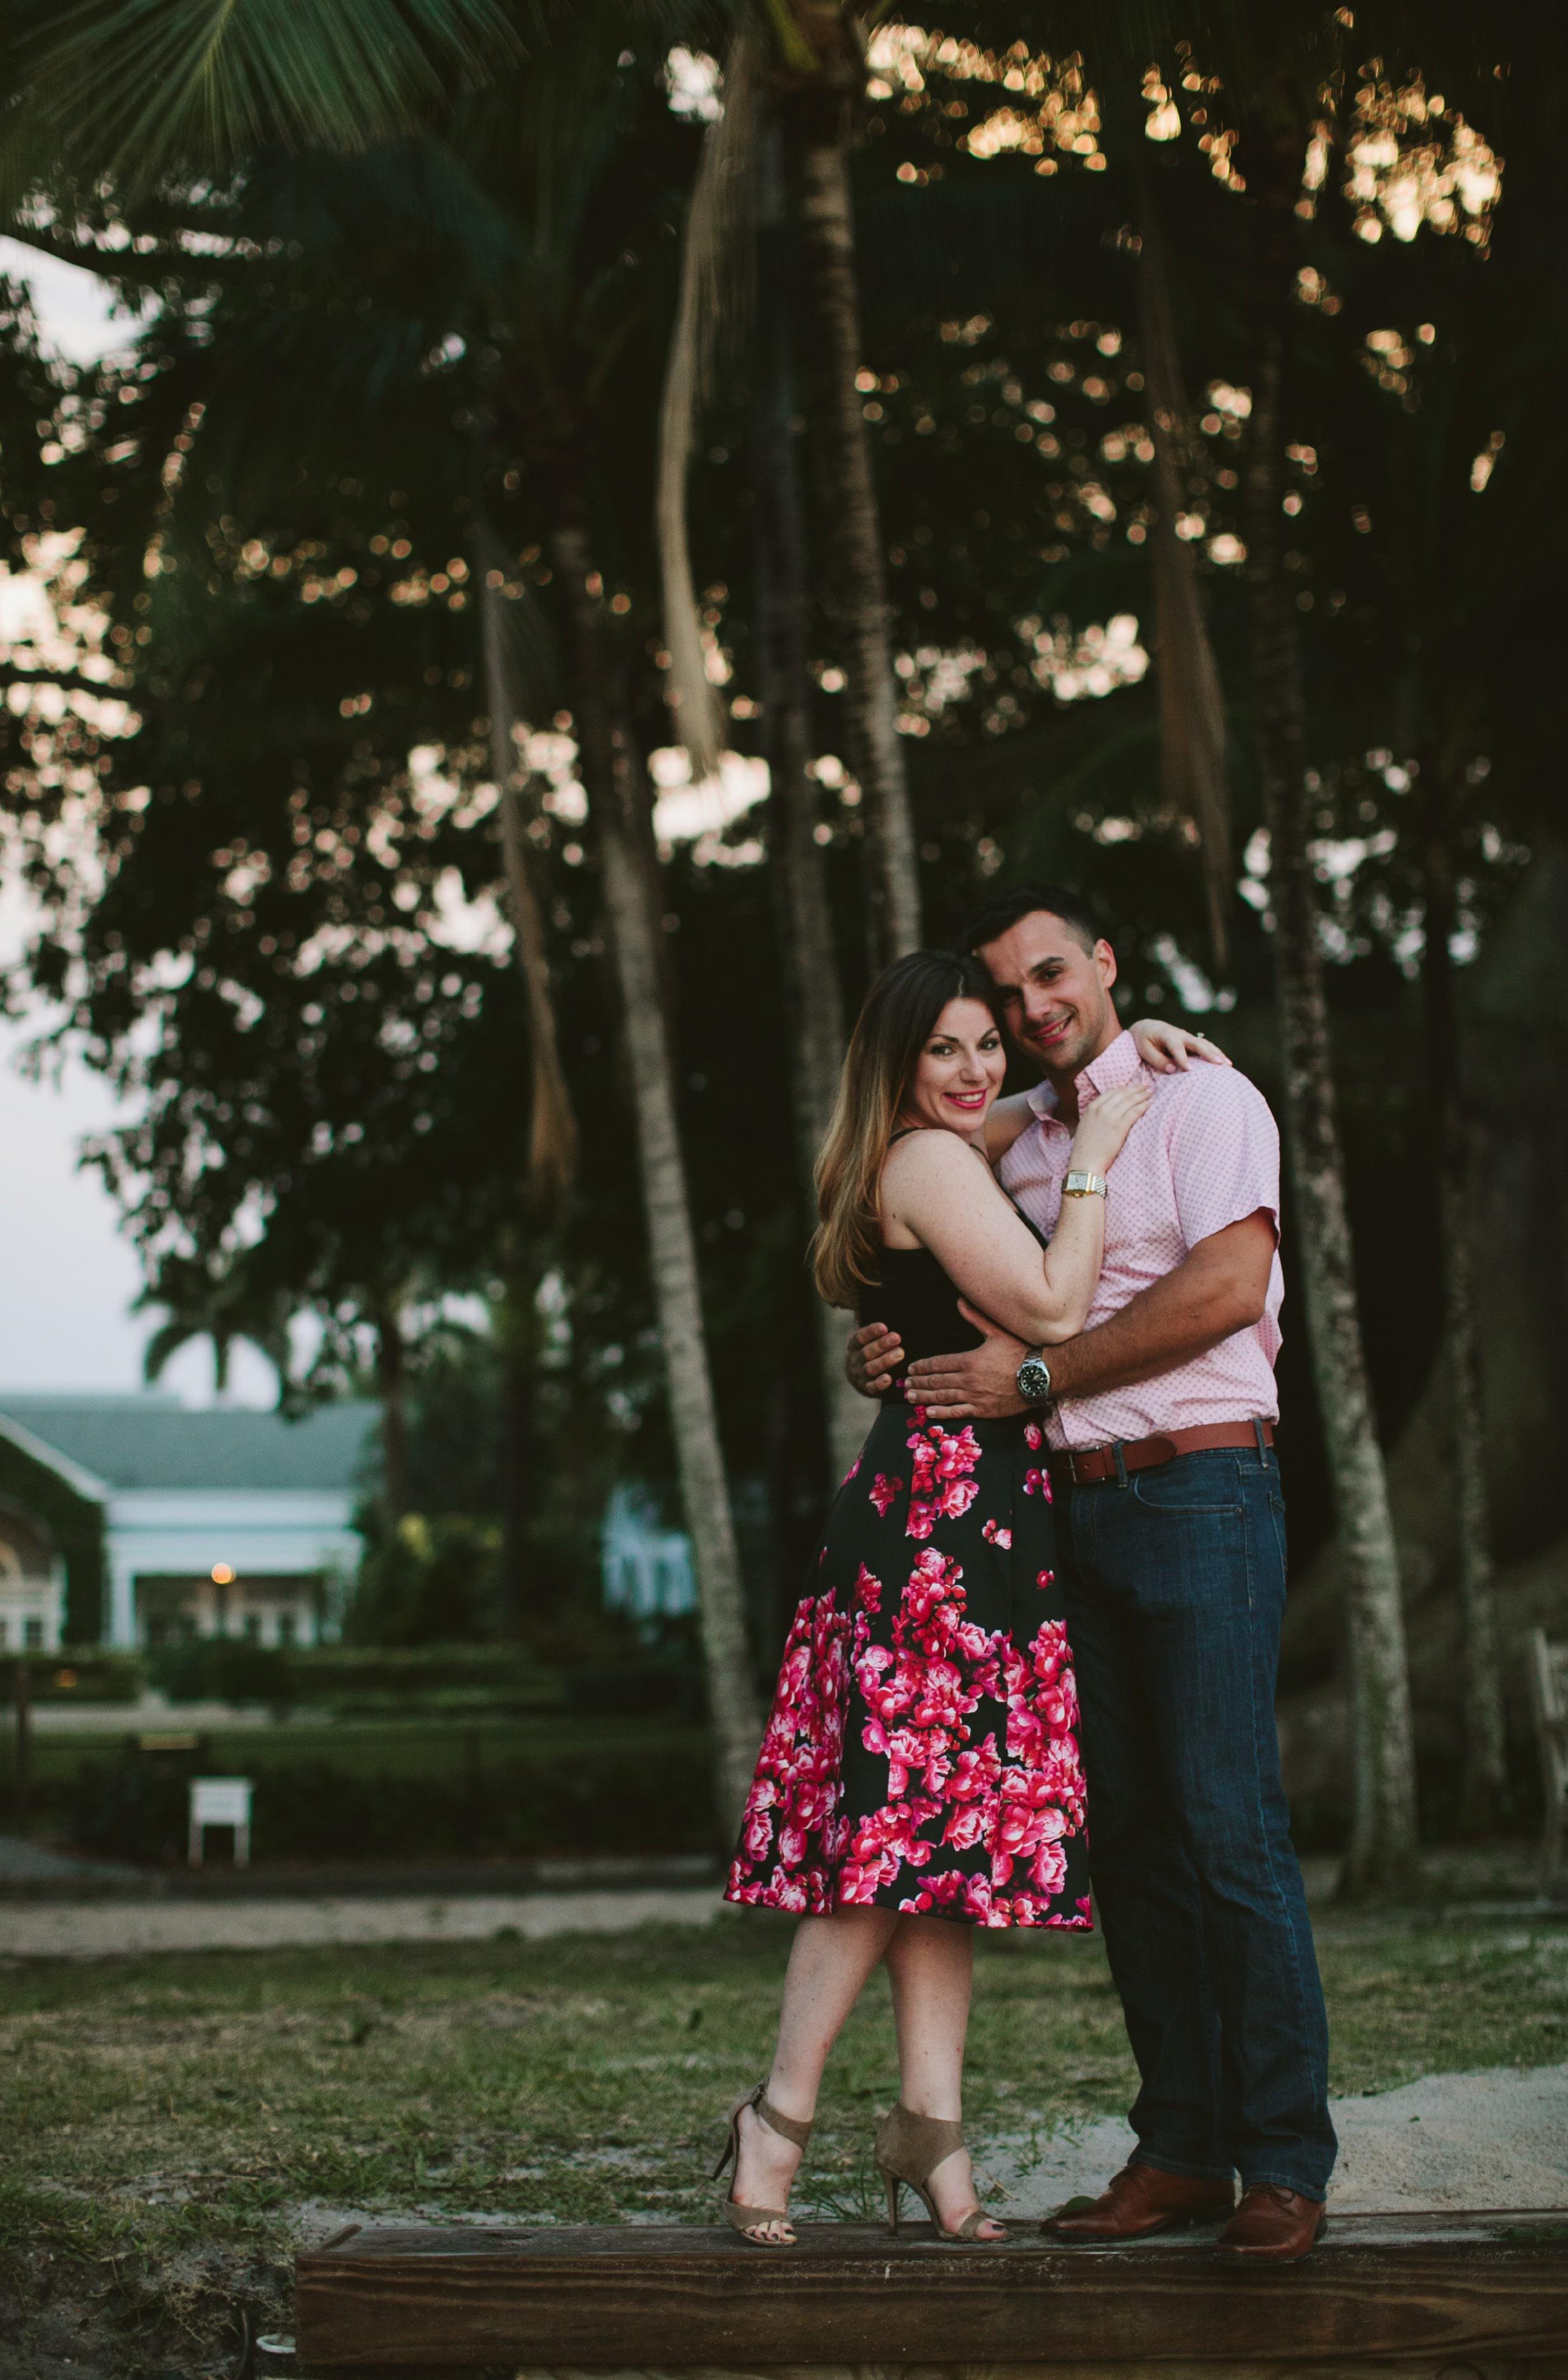 Ida + Danny Surprise Proposal Engagement Shoot at Flagler Museum Palm Beach6.jpg